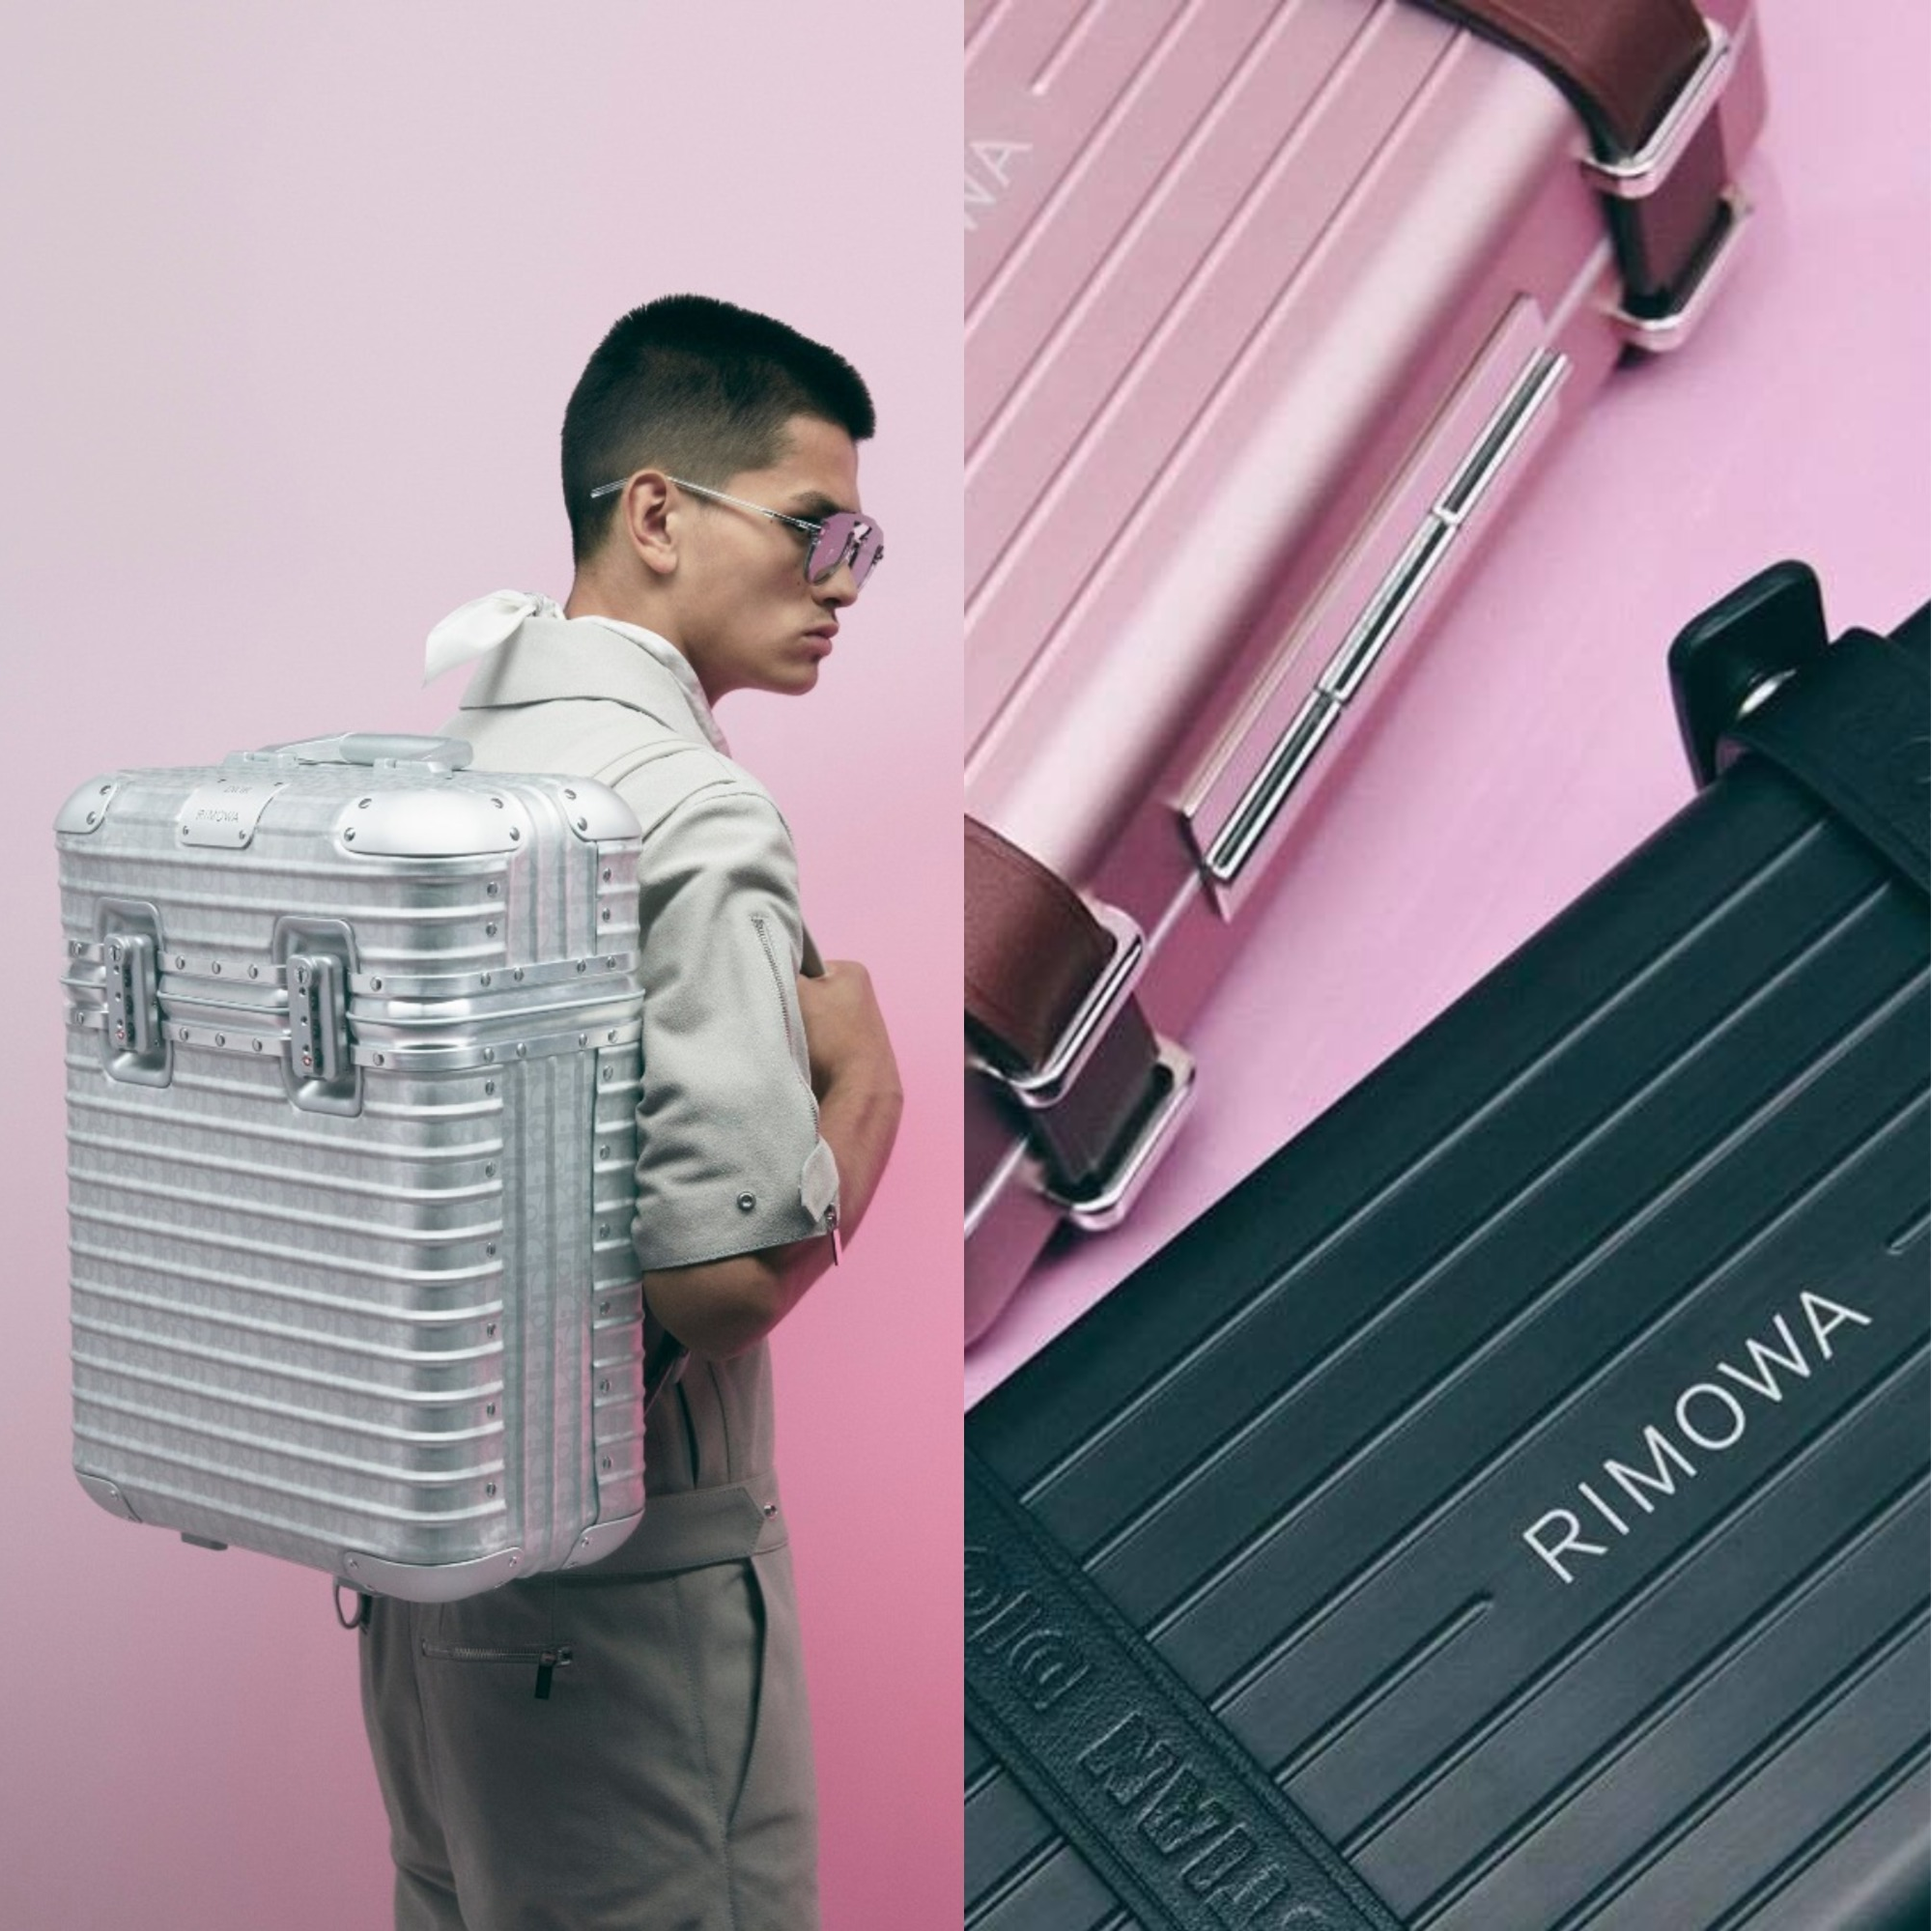 Dior 攜手 RIMOWA 打造「DIOR and RIMOWA」特別系列!